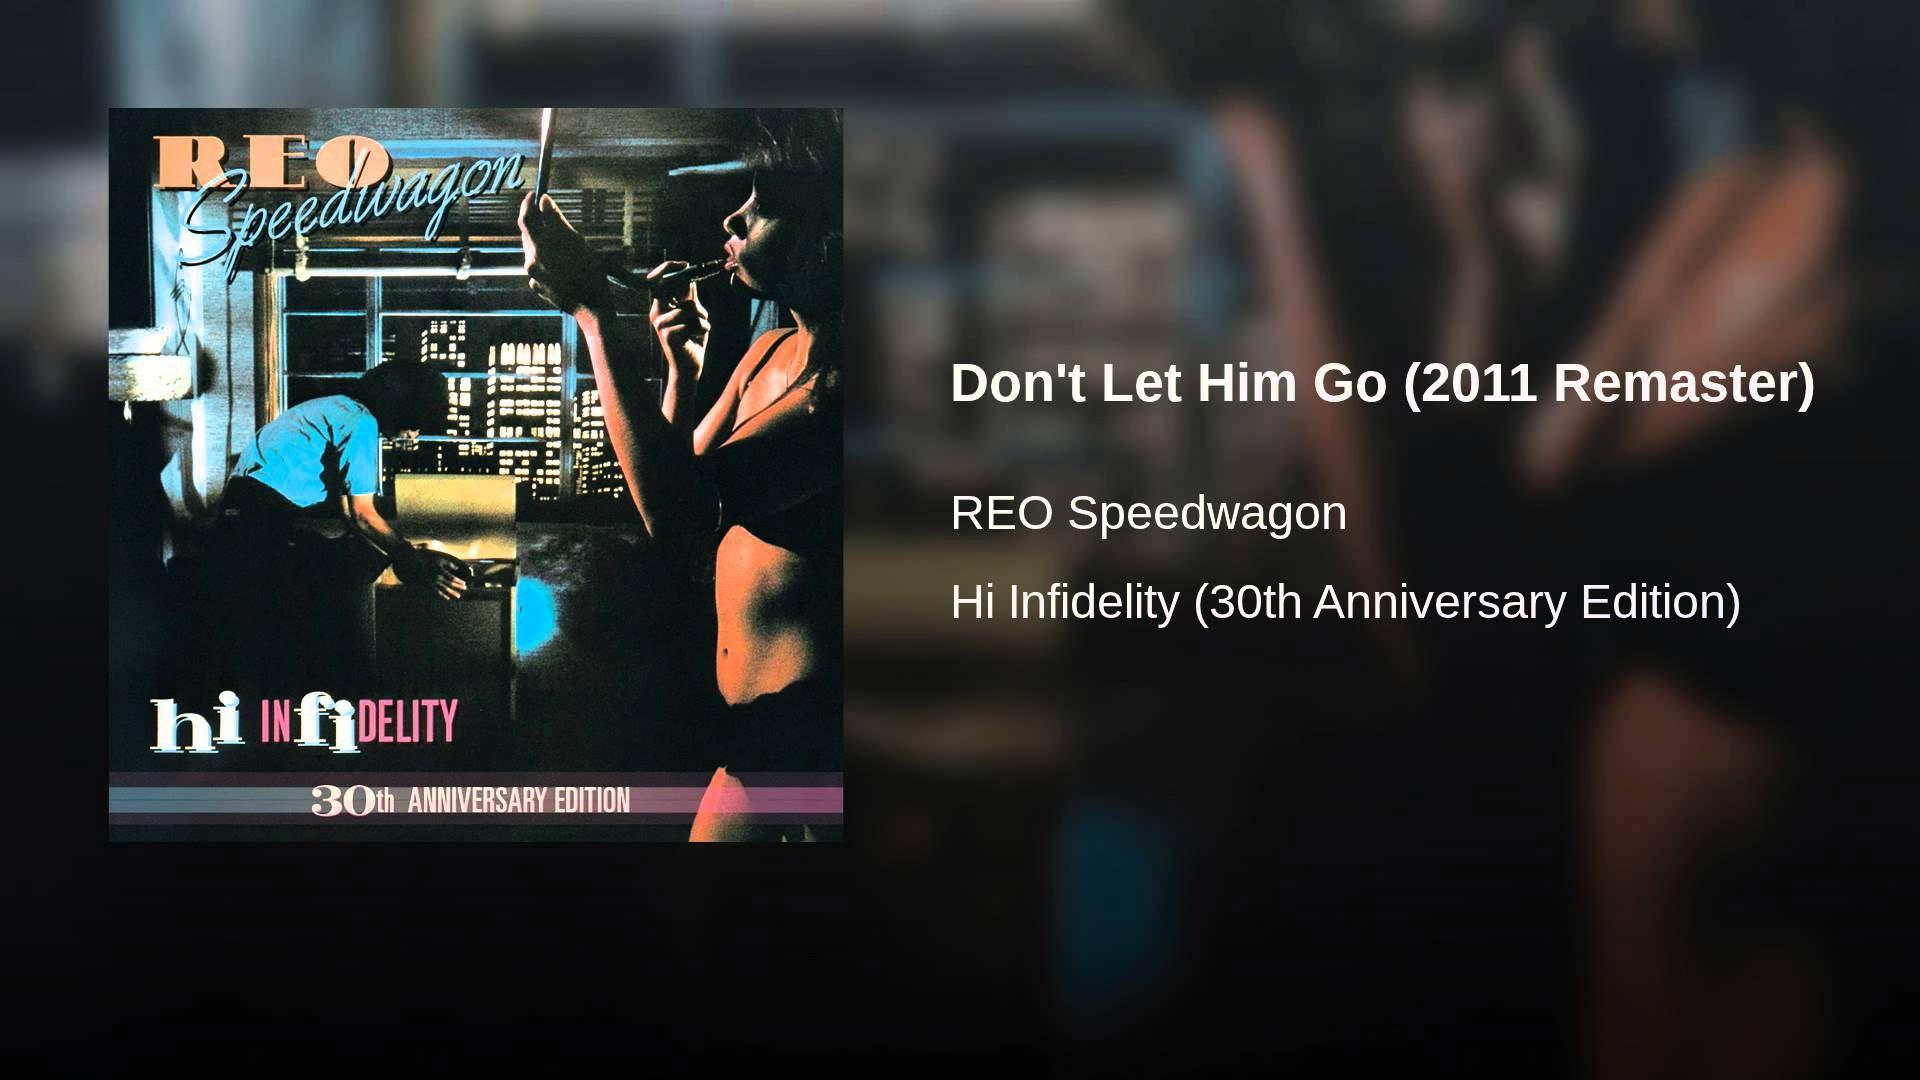 Don't Let Him Go (2011 Remaster)